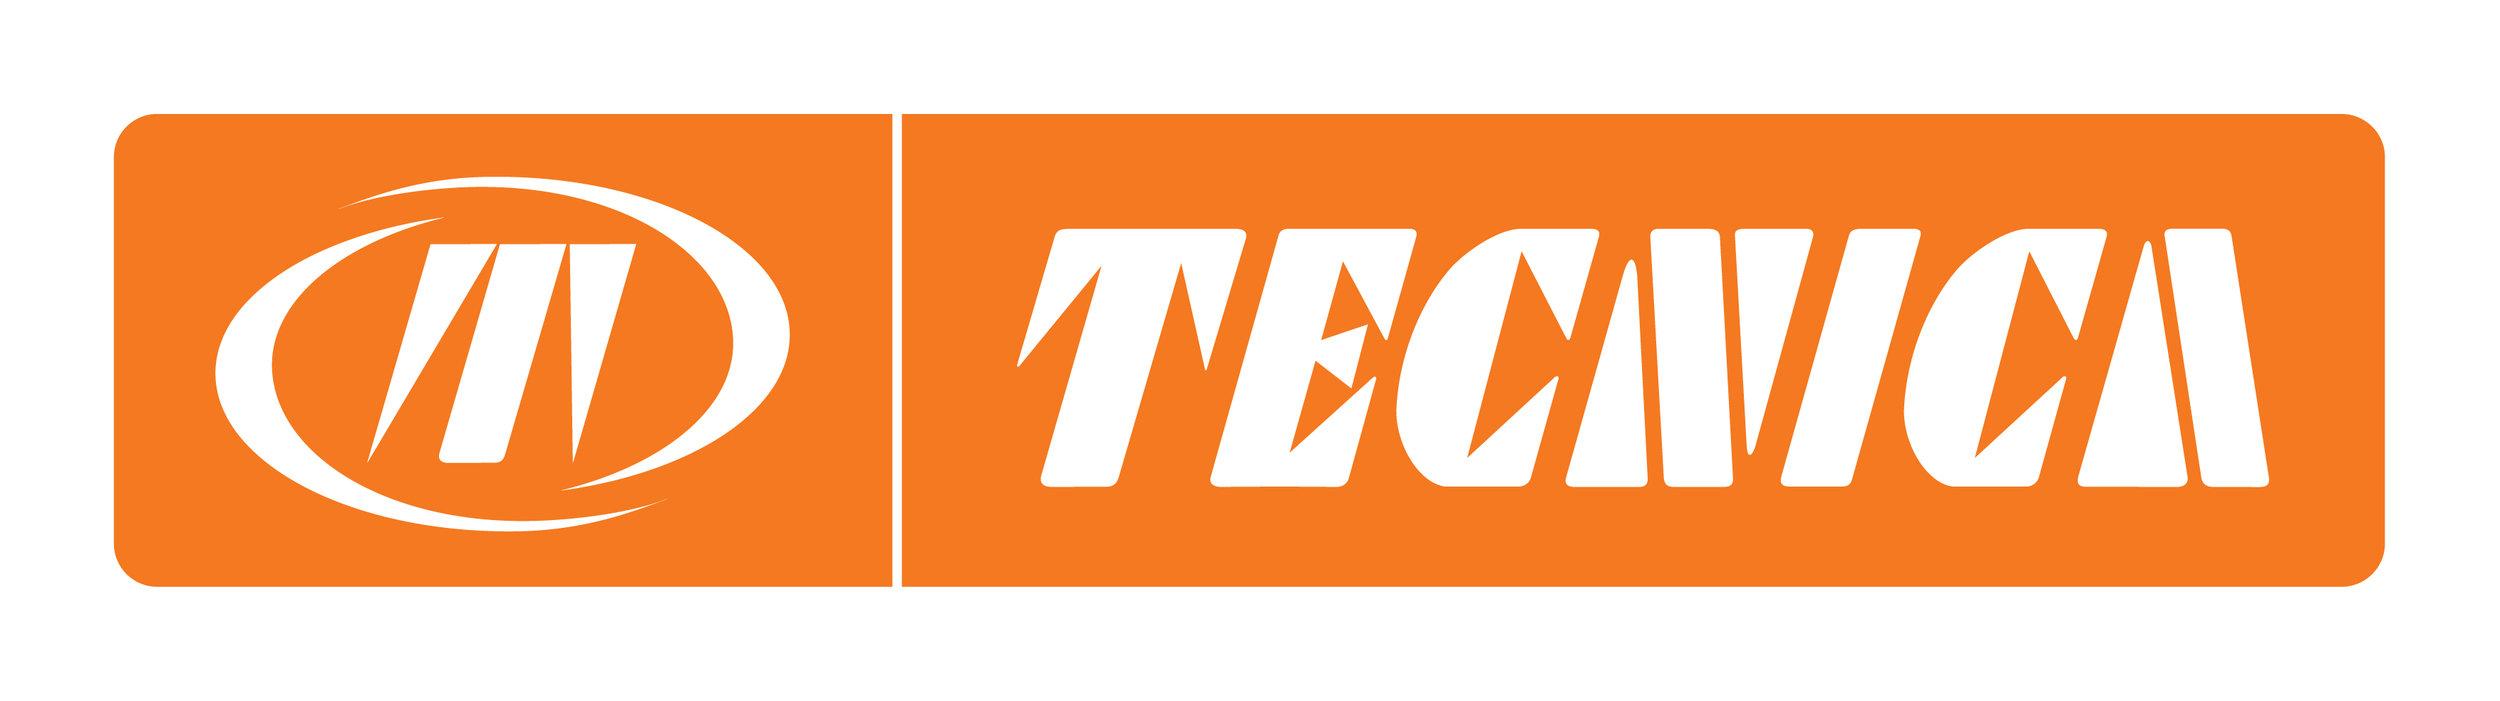 TecnicaLogo.jpg